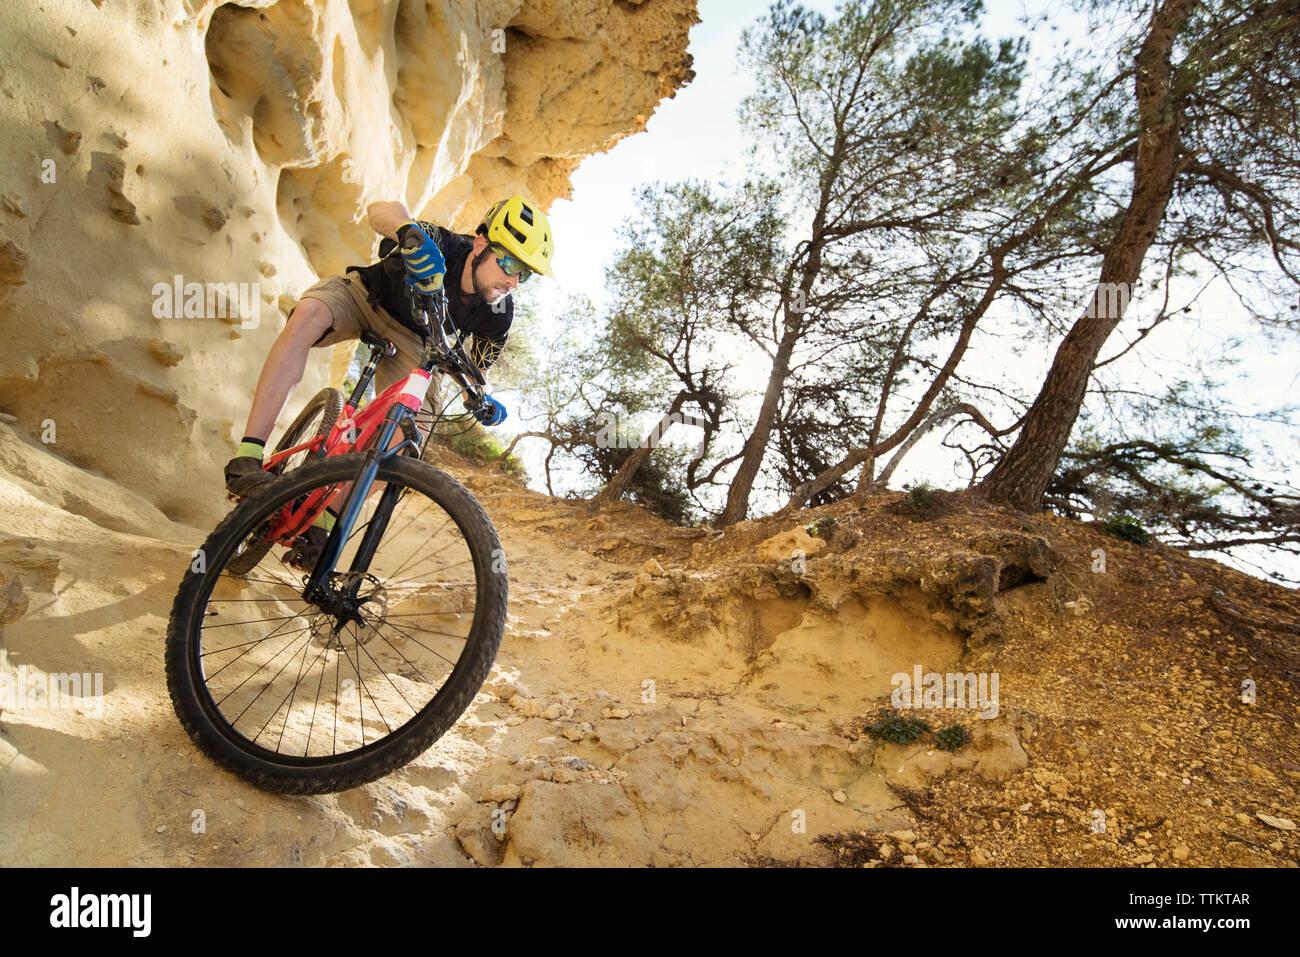 Cyclist descending through a very technical area of sandstone Stock Photo